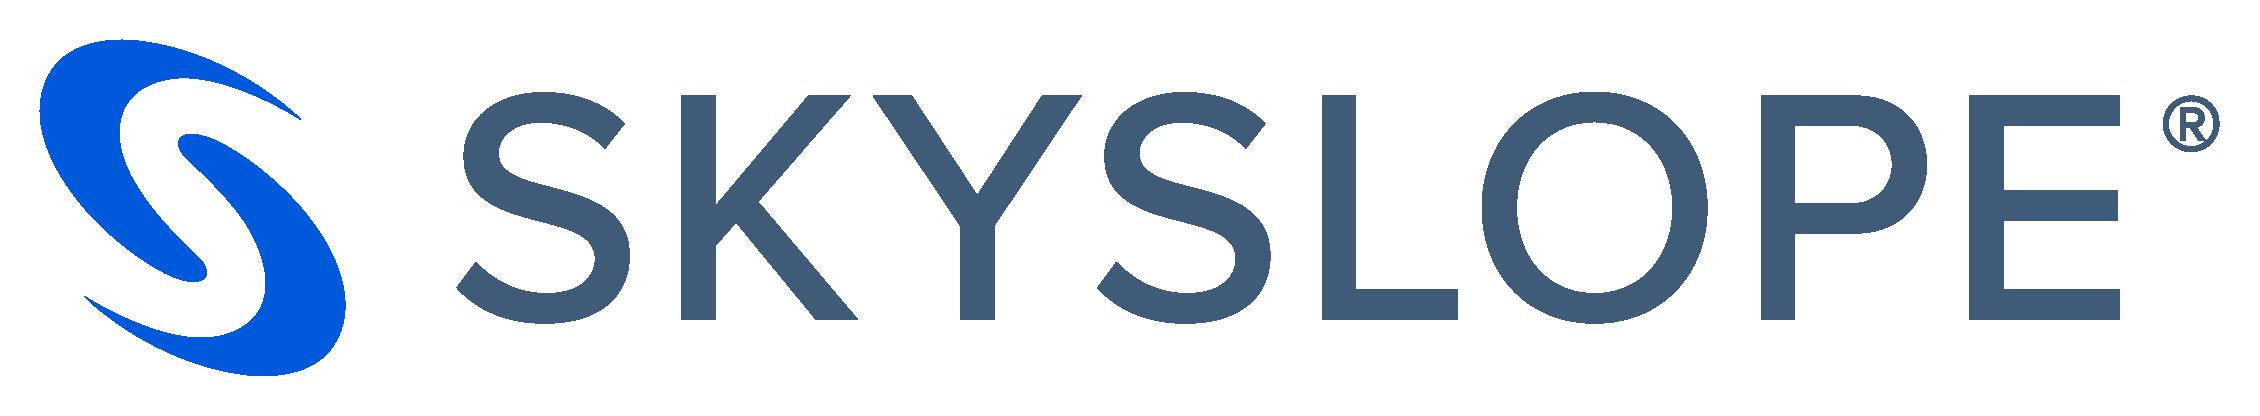 SkySlope logo